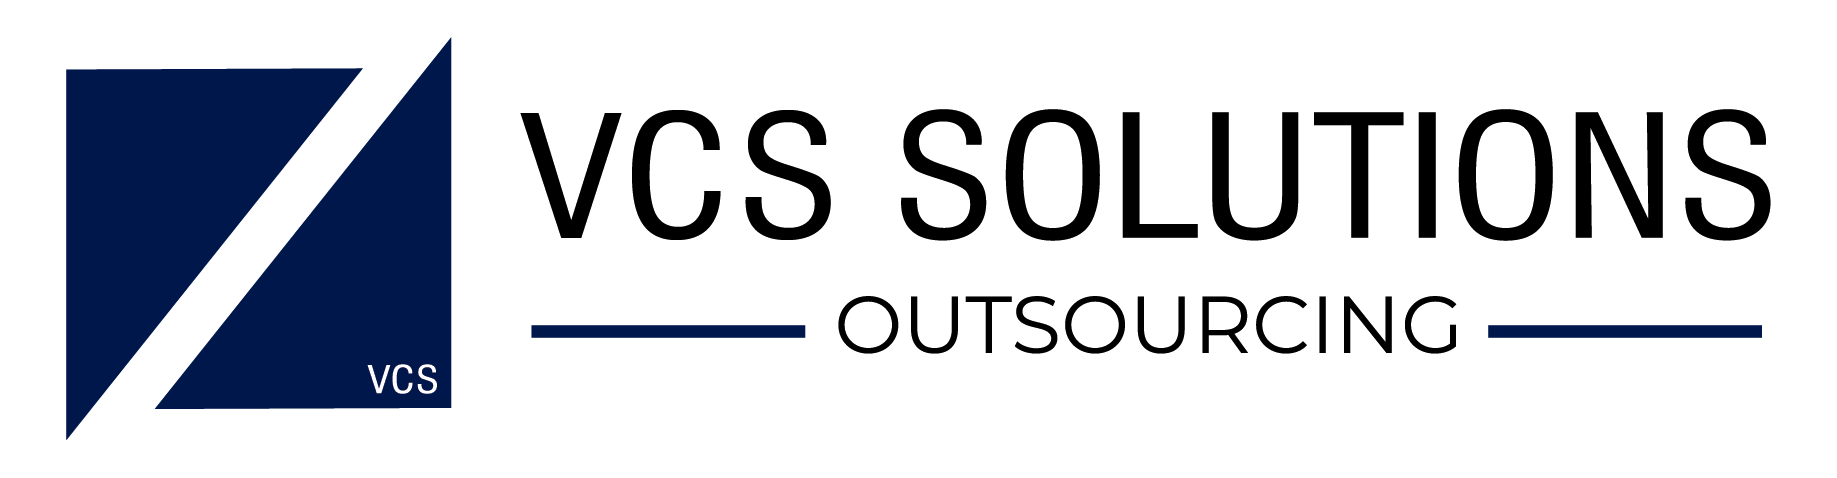 VCS Solutions S.A.C.